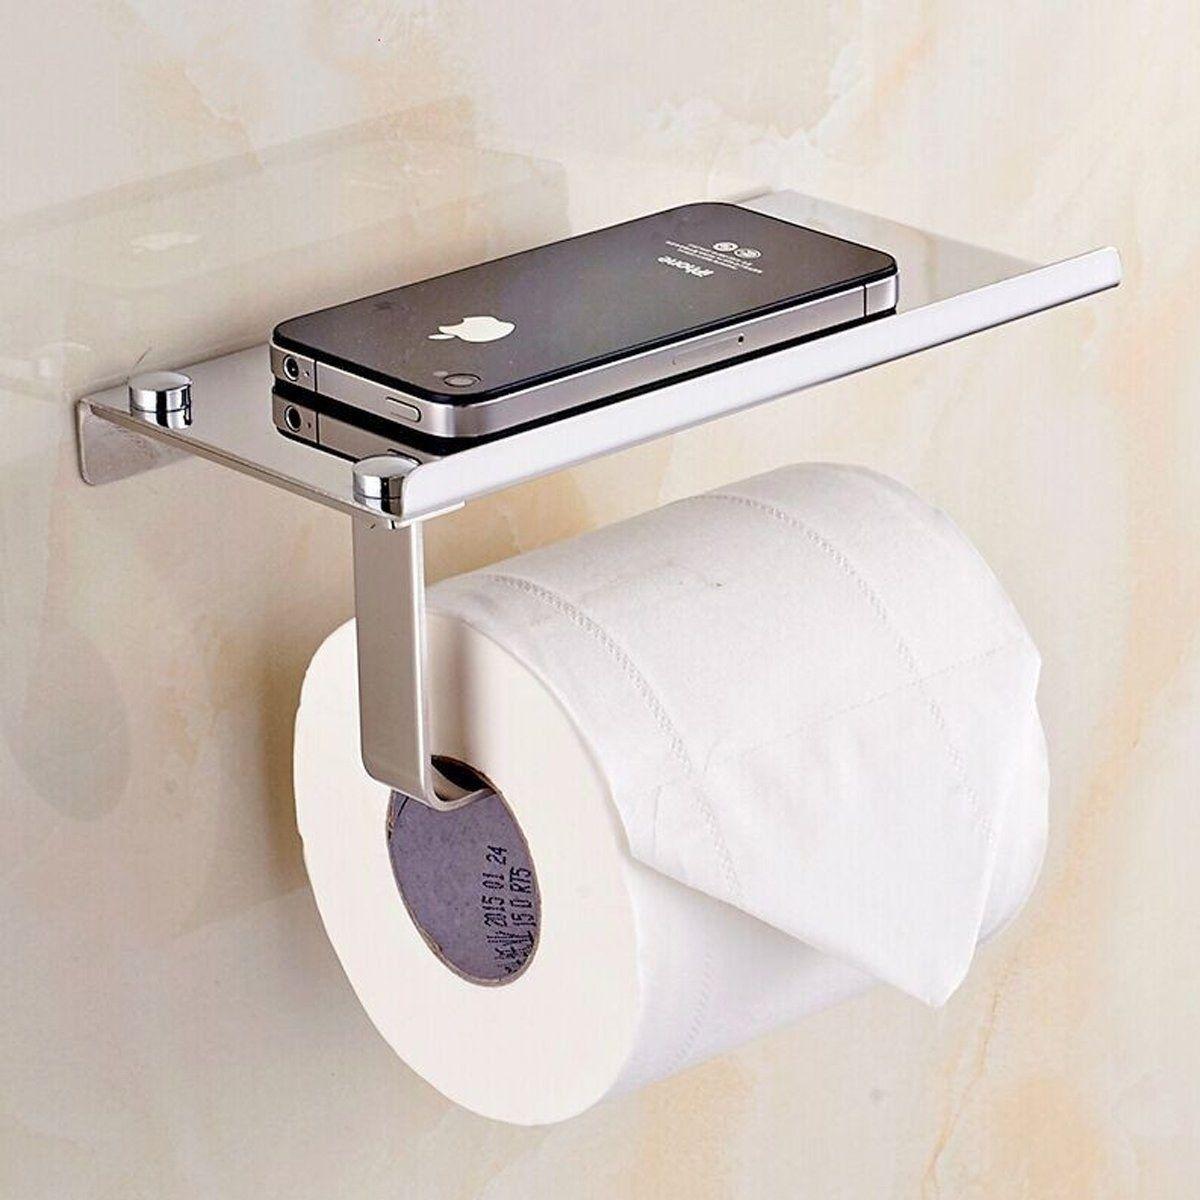 35 Things Thatu0027ll Make Your Bathroom Look Like A Million Bucks